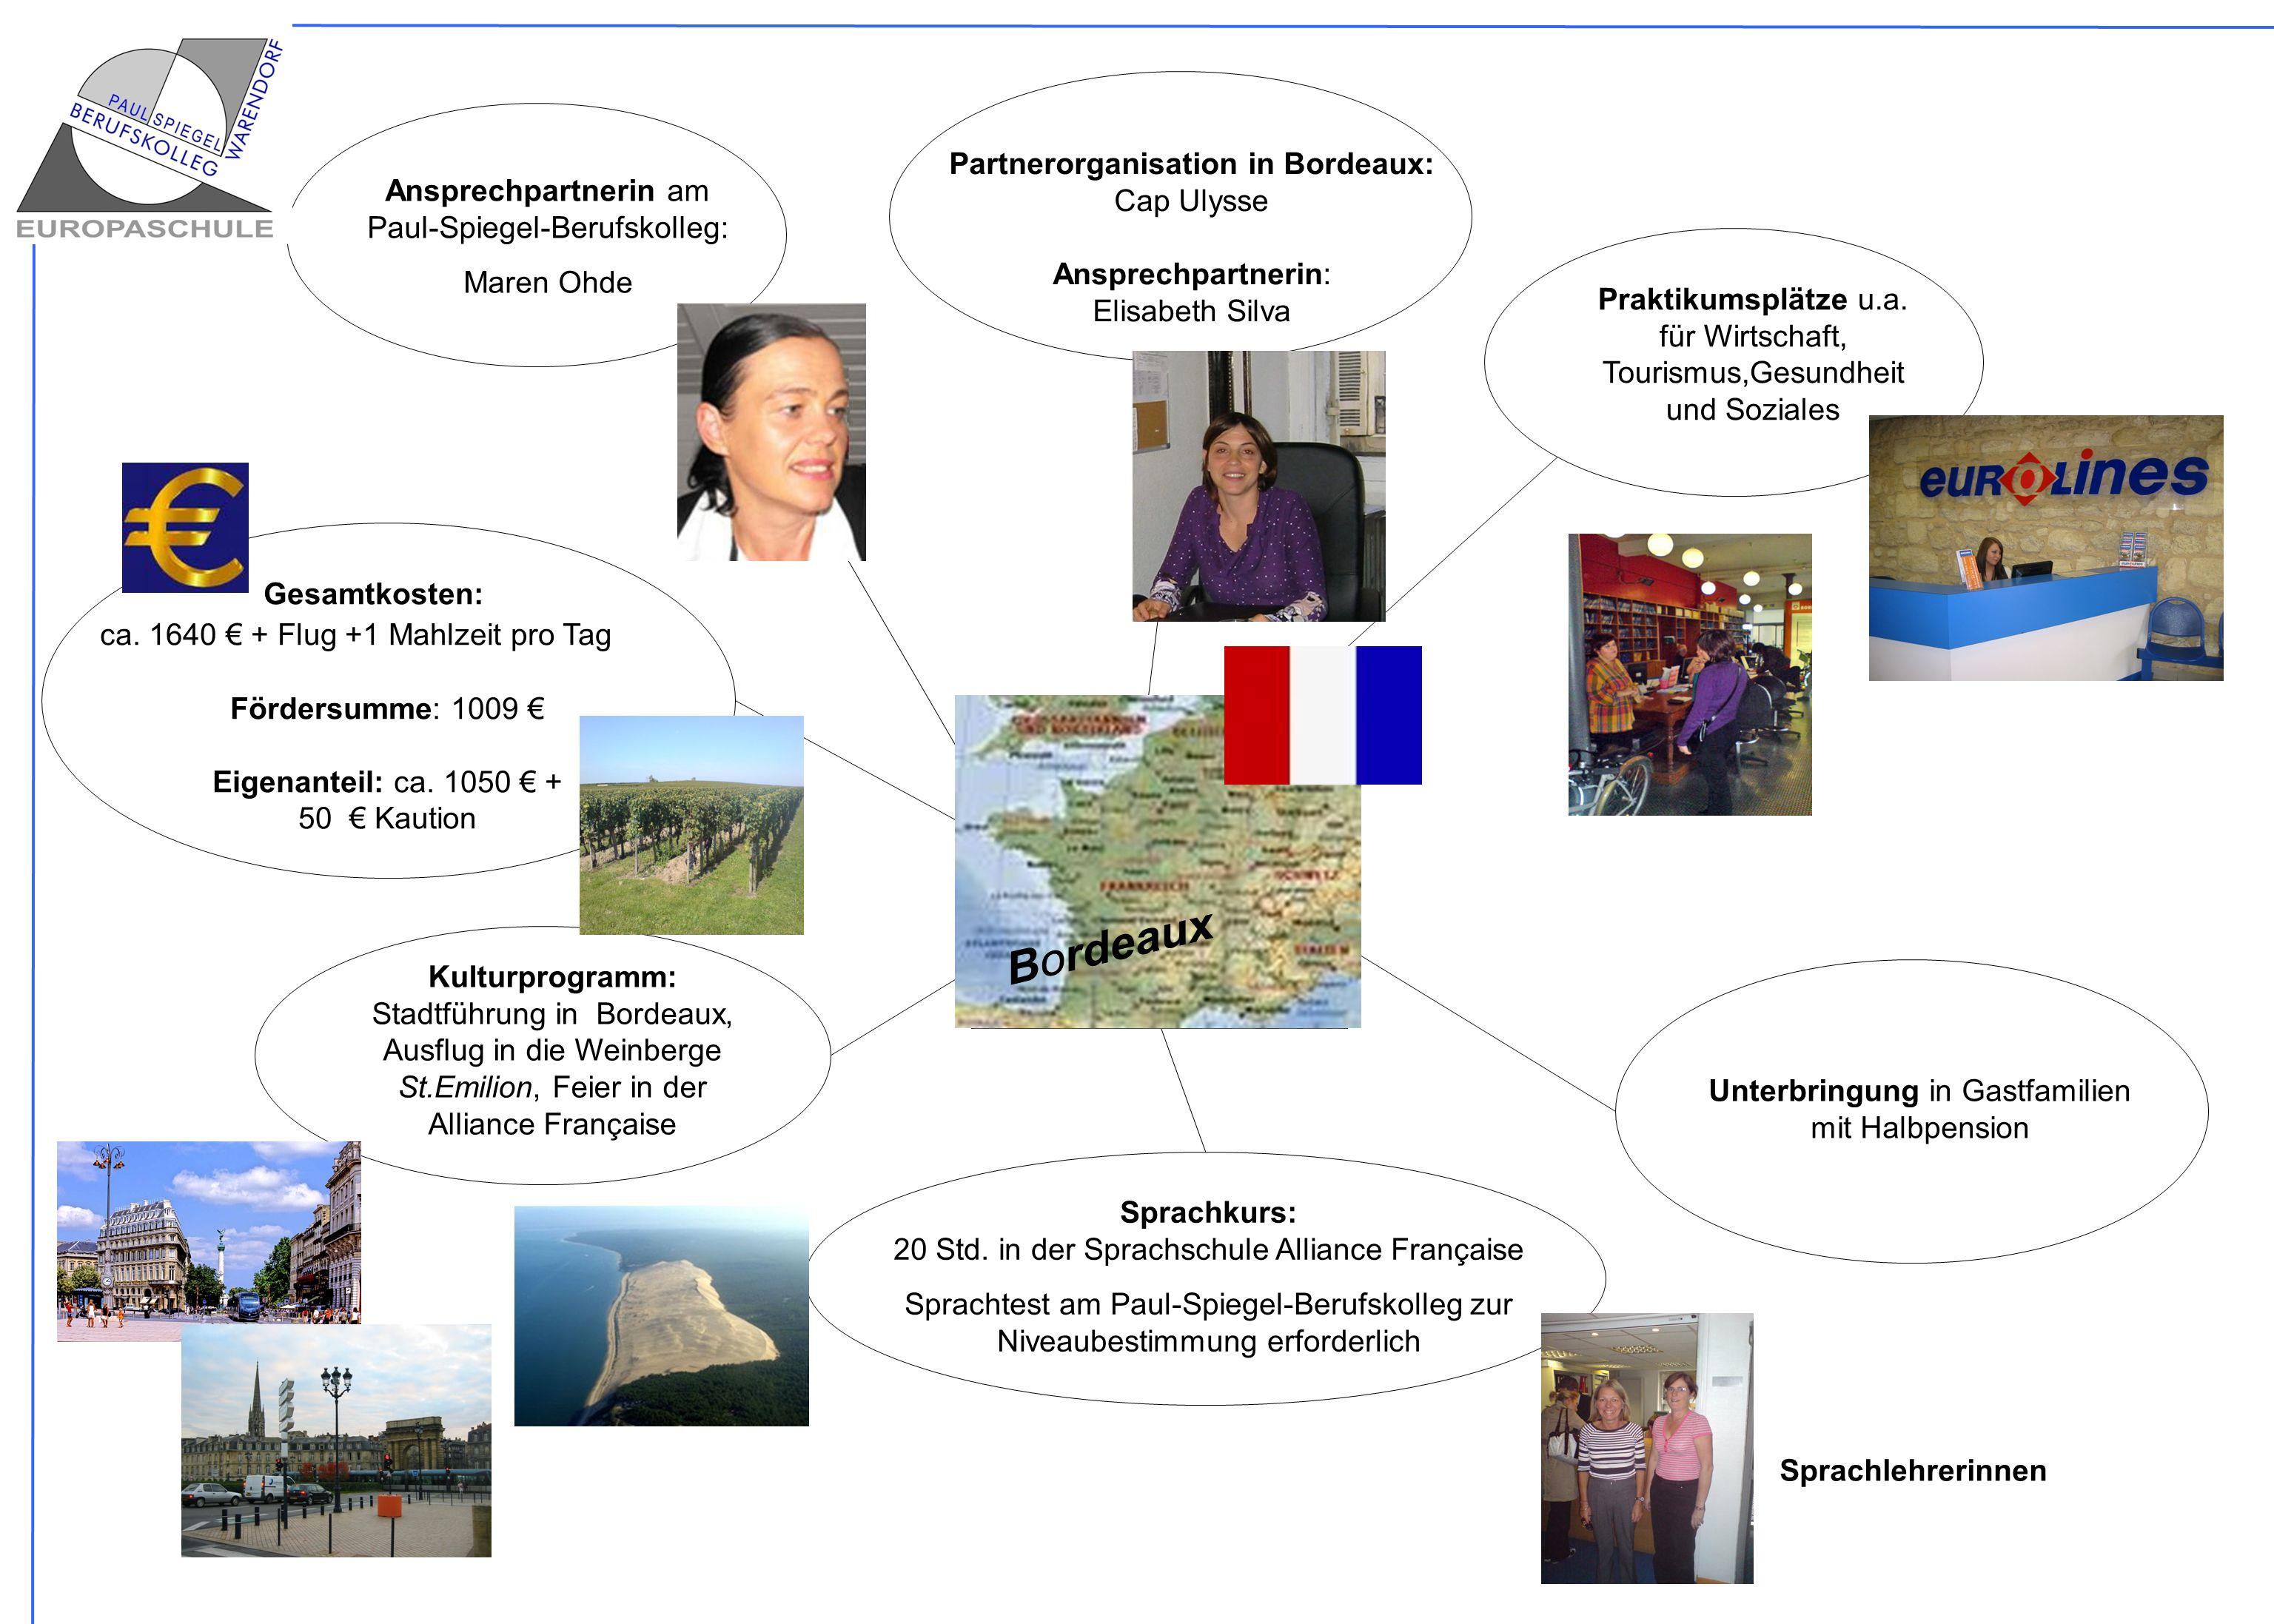 Projektmanagement 26.06.2013 - 18.00 Uhr 2.